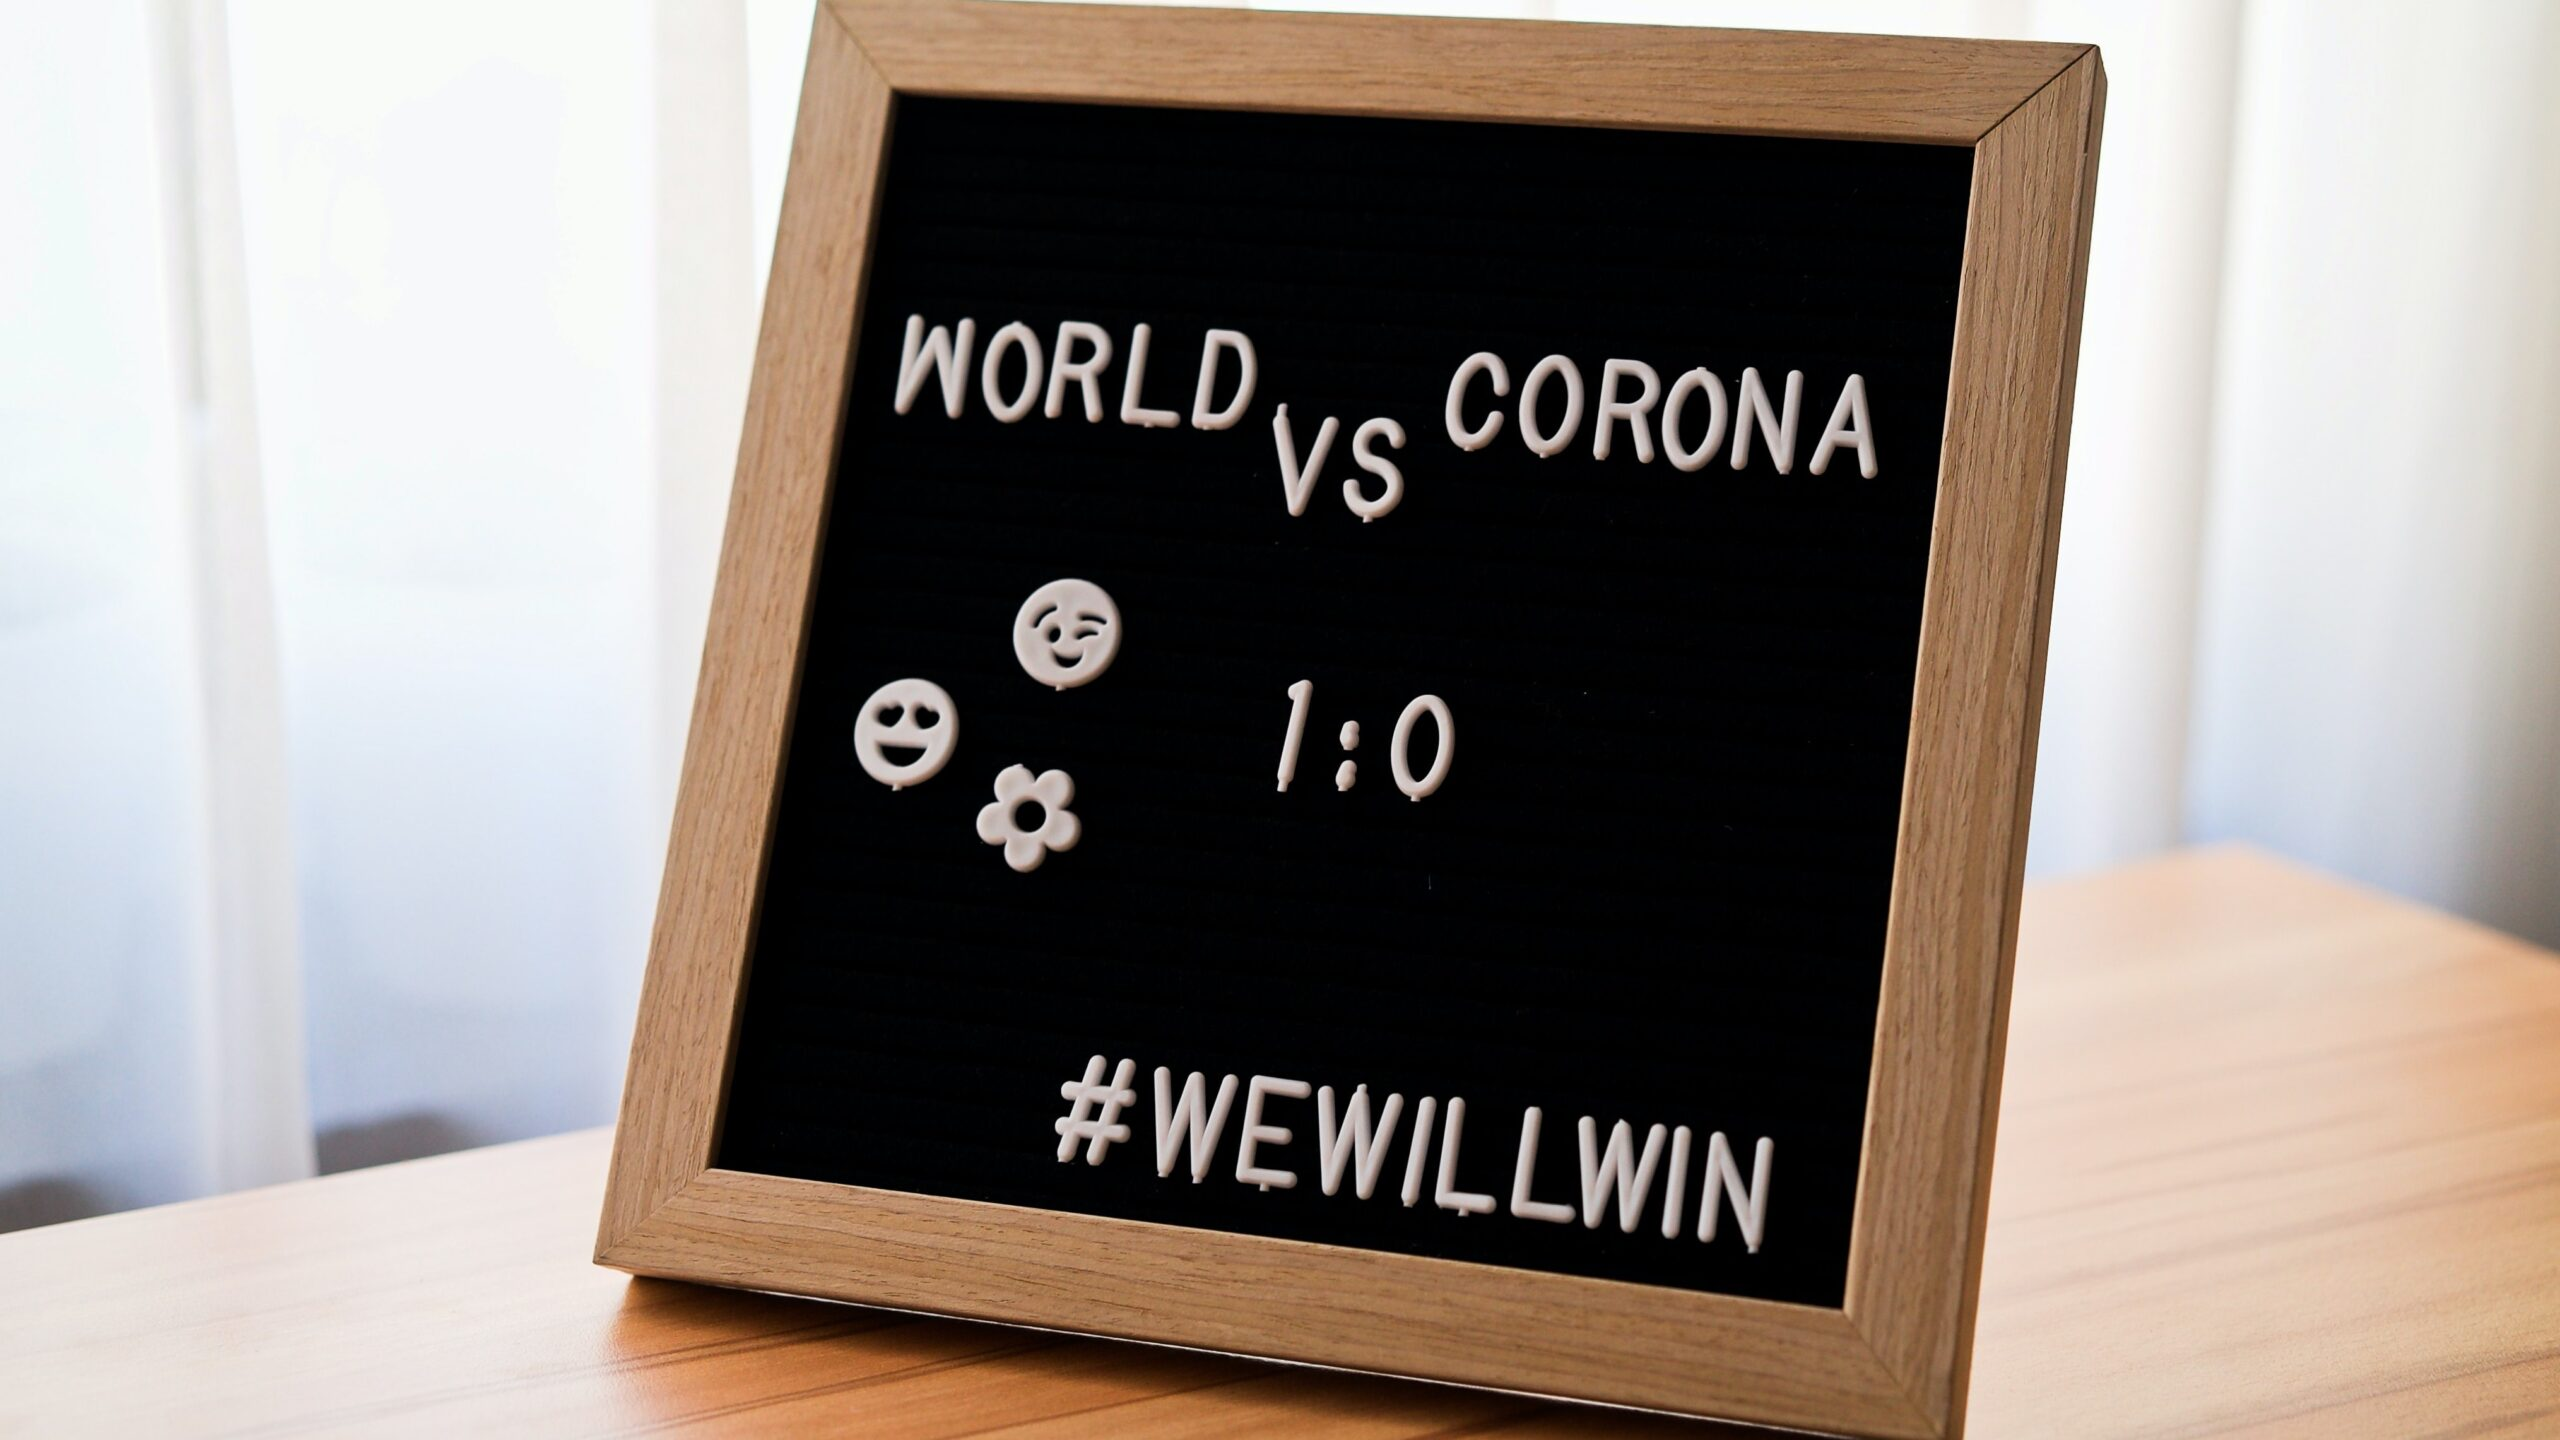 Blackboard: Word vs Corona 1:0